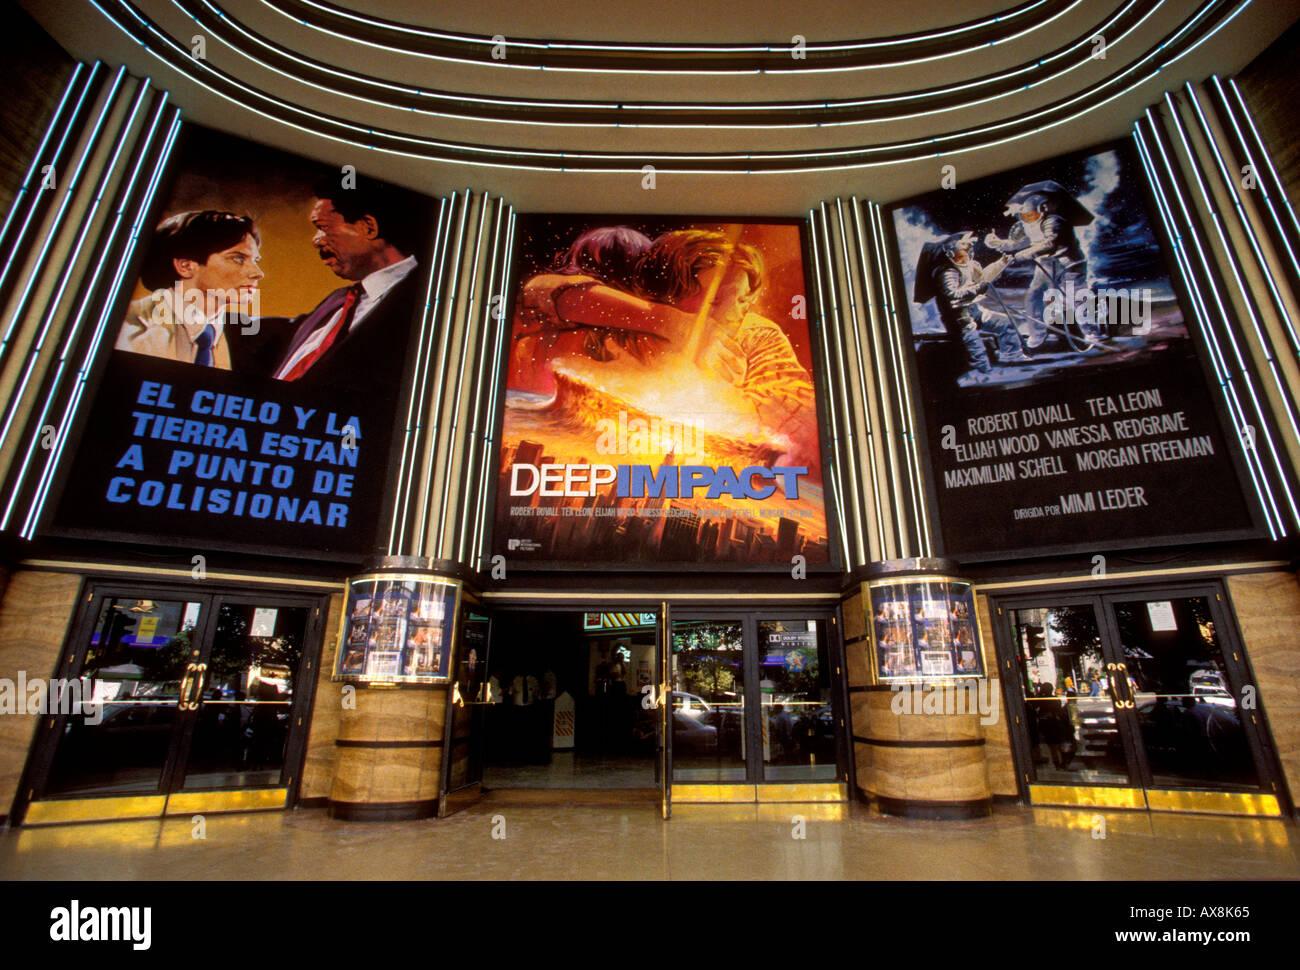 Spanish language film, movie schedule, multiplex movie theater, multiplex, movie theaters, Gran Via, Madrid, Madrid Province, Spain - Stock Image